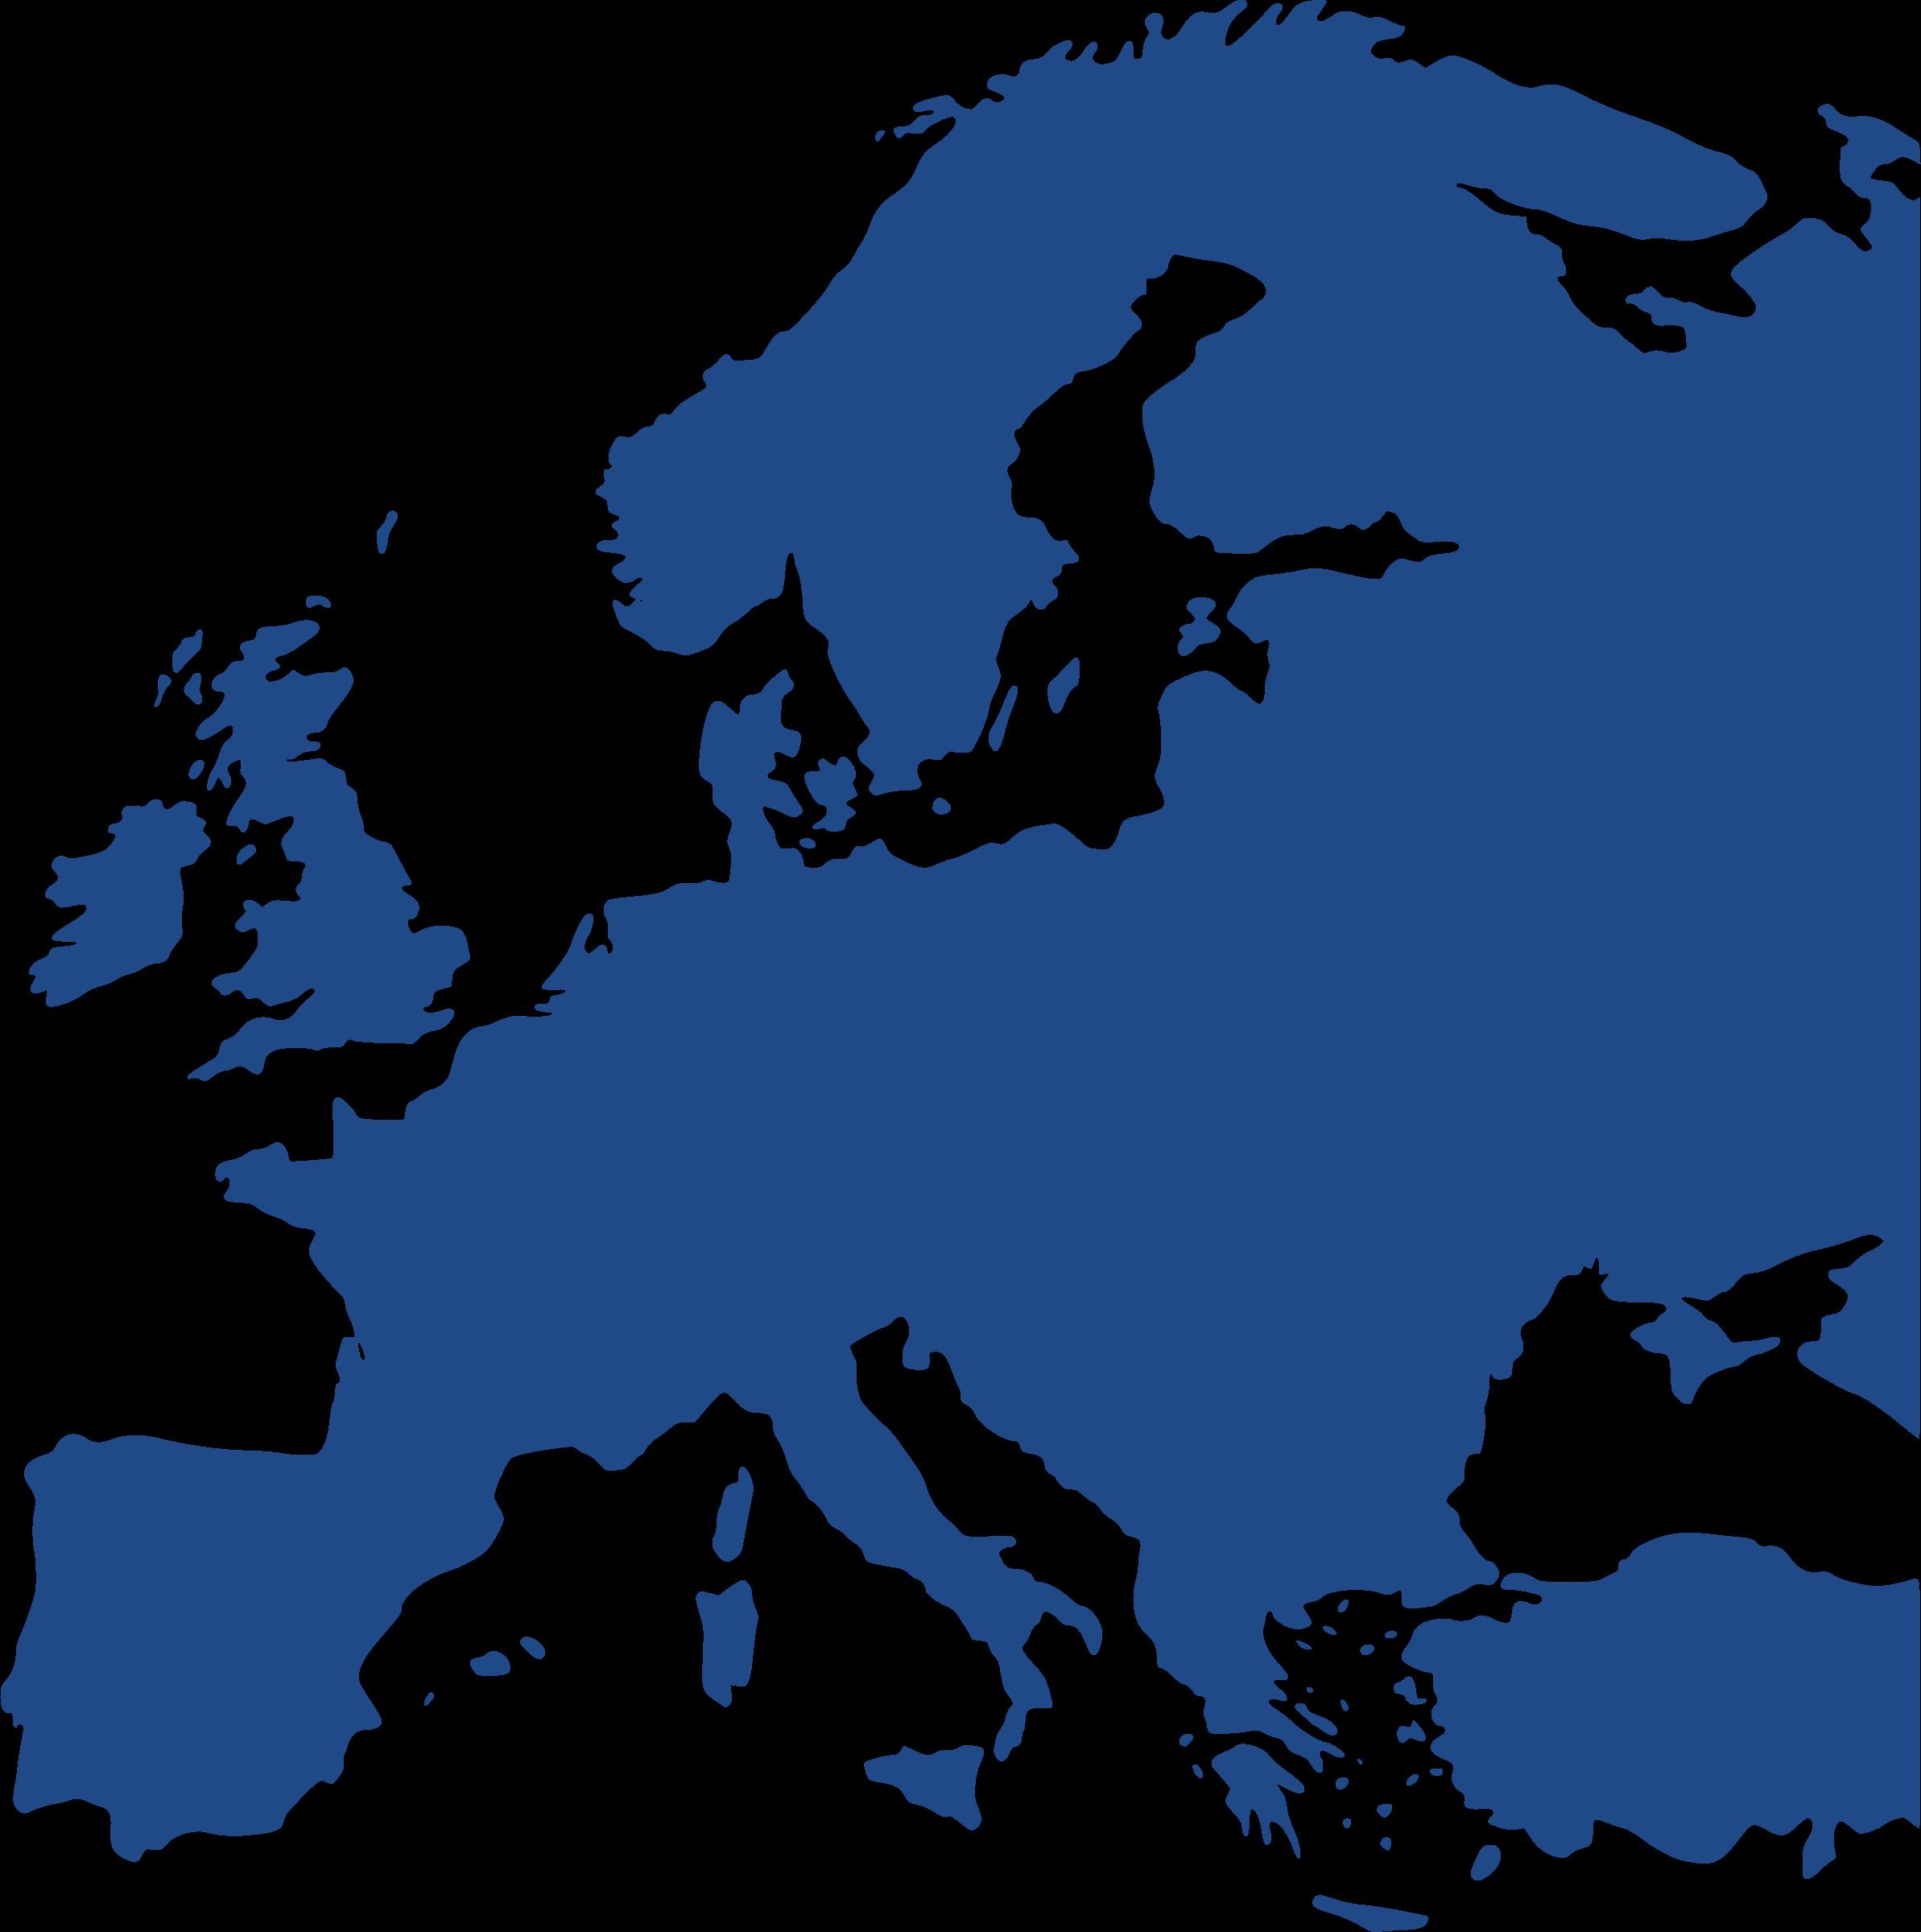 Map Of Europe Equidistant